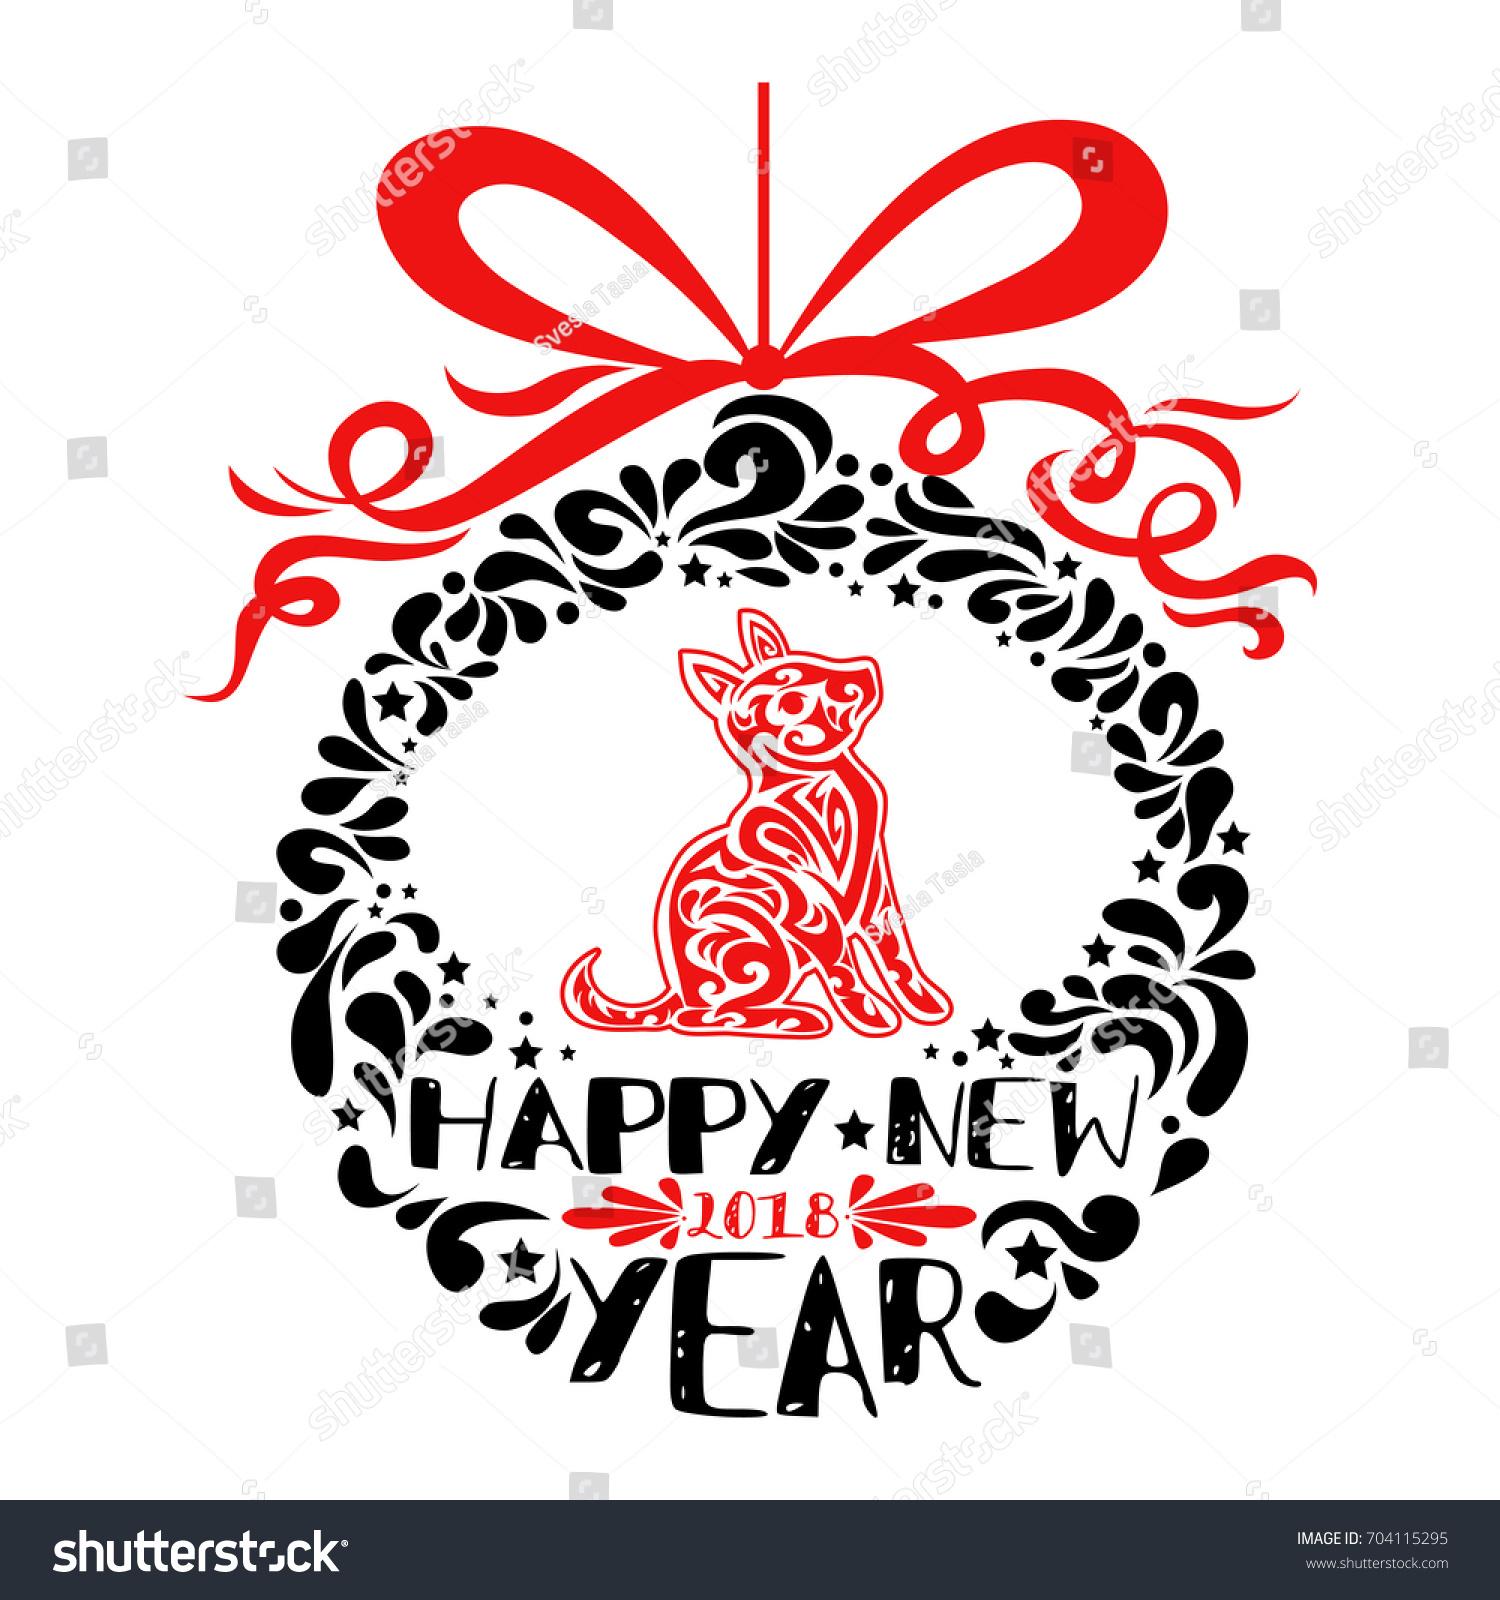 Christmas ball dog silhouette zodiac symbol stock vector 704115295 christmas ball with dog silhouette zodiac symbol happy new year 2018 text christmas design biocorpaavc